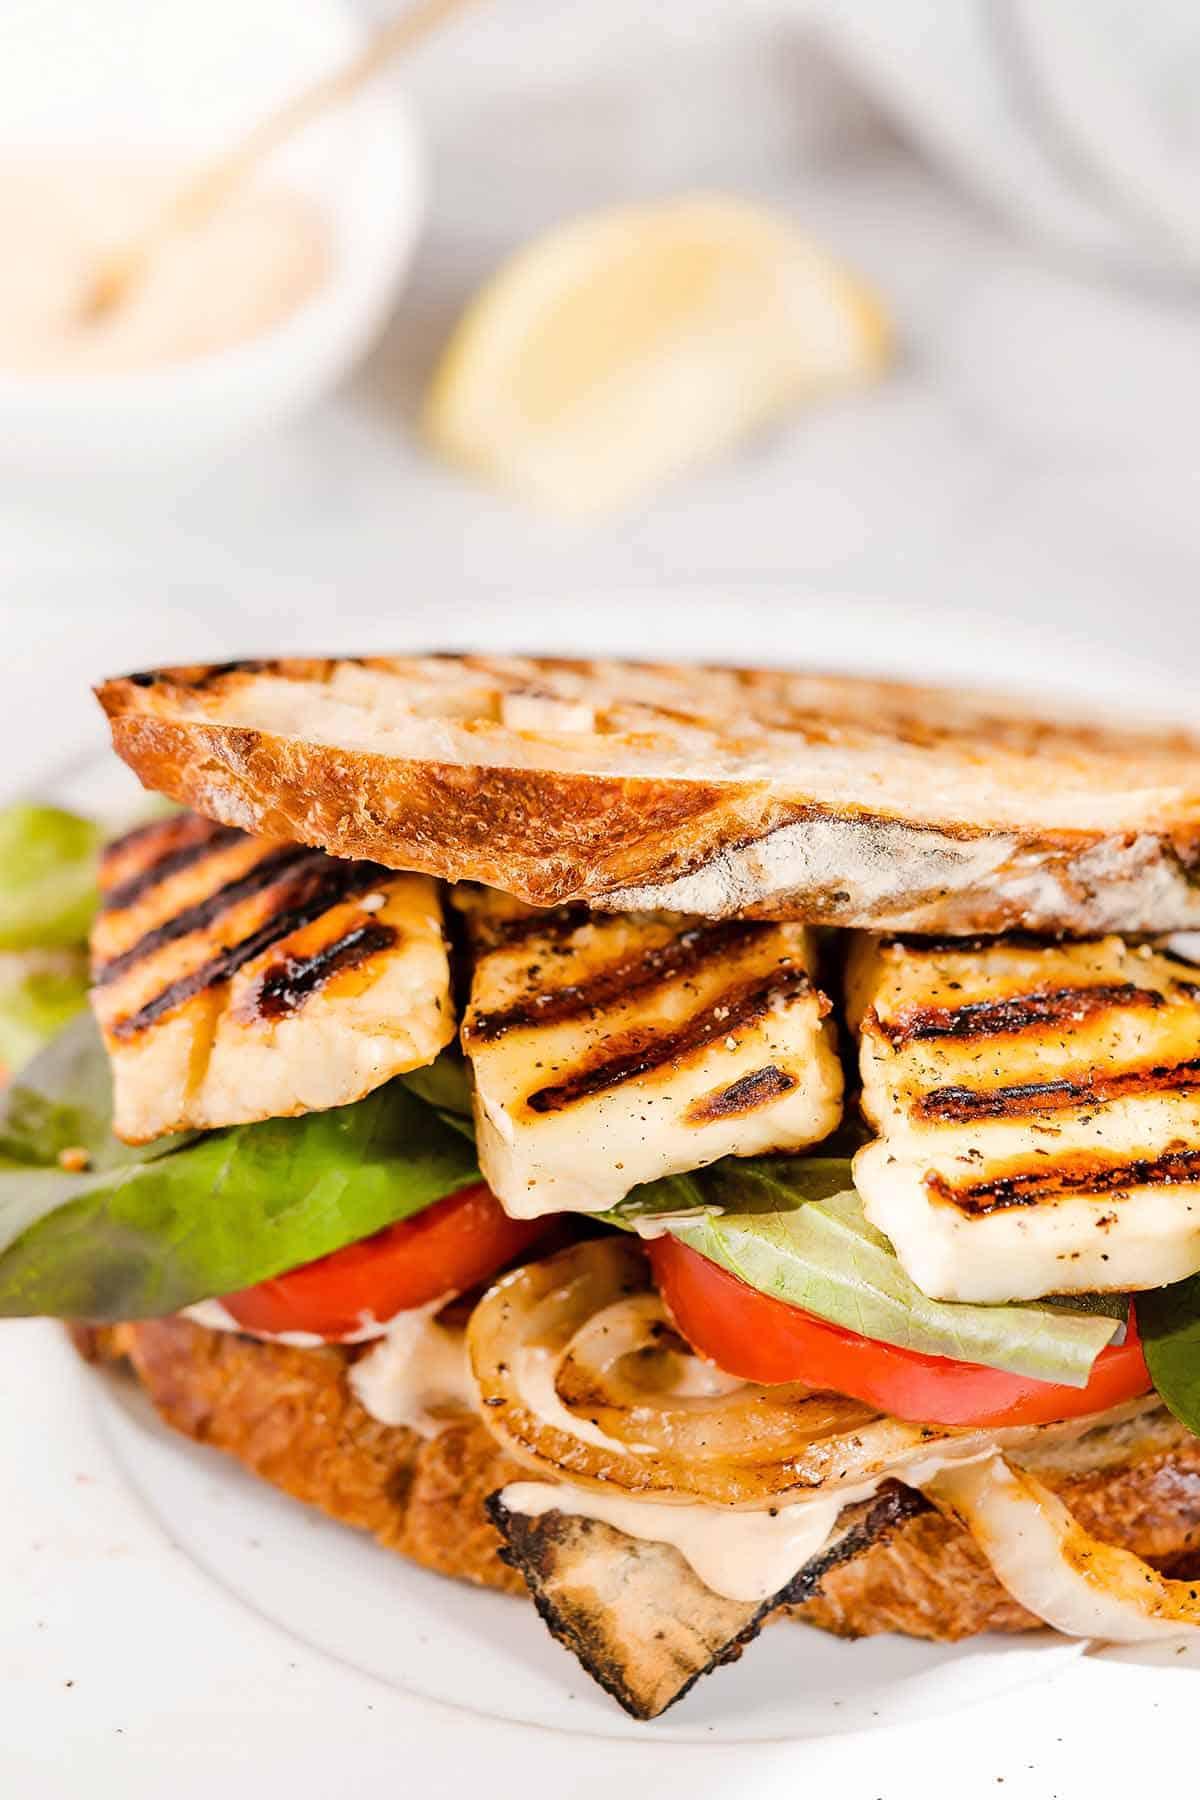 halloumi sandwich on white plate